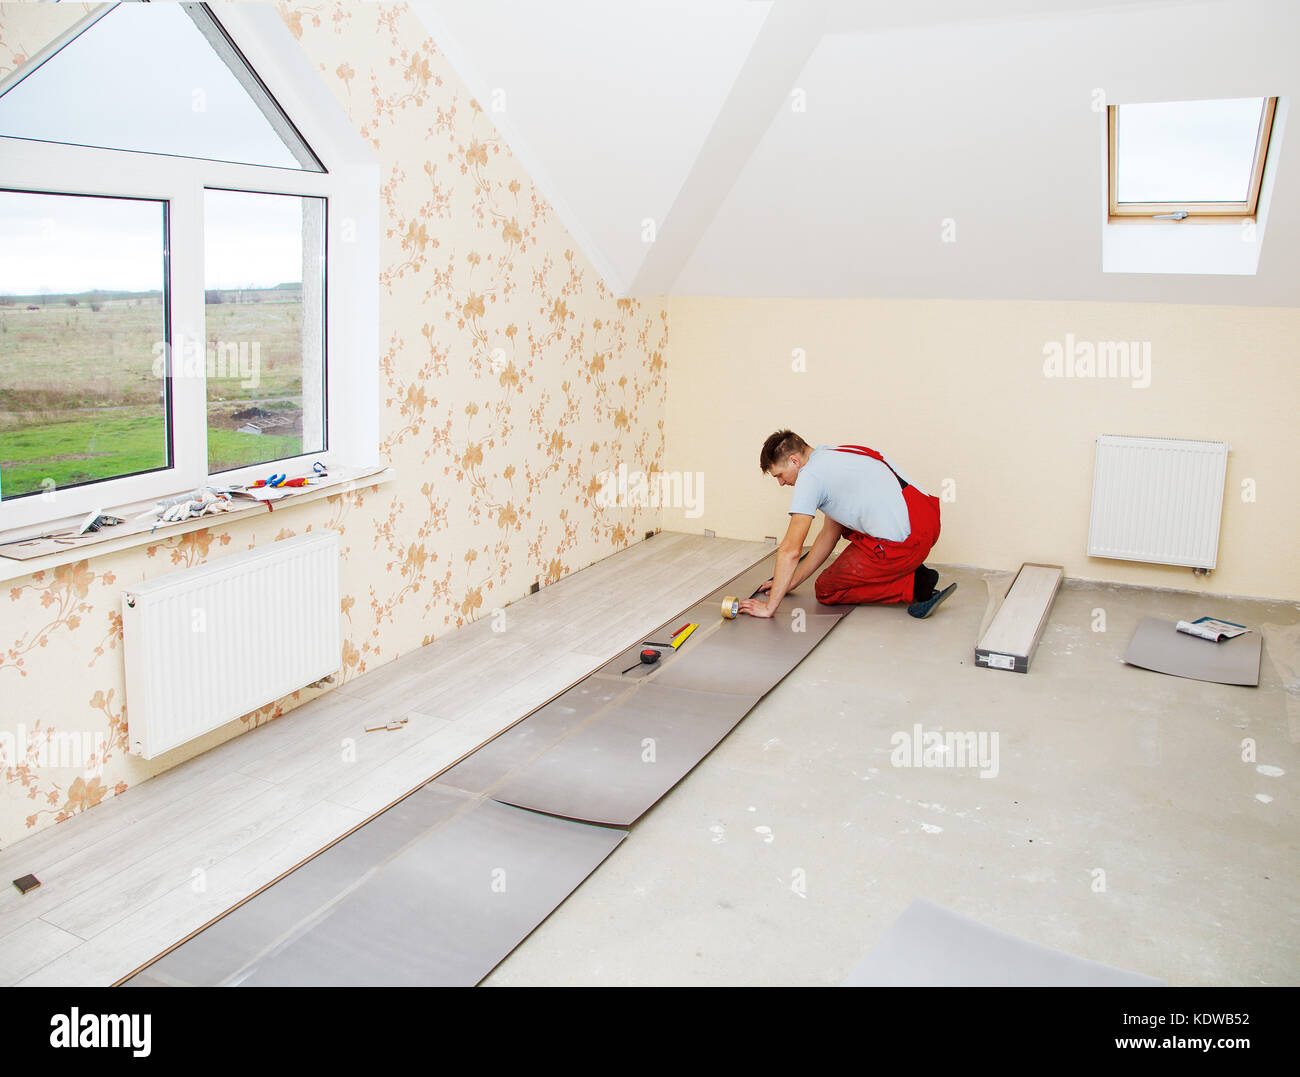 handyman laying down laminate flooring boards while renovating a house - Stock Image